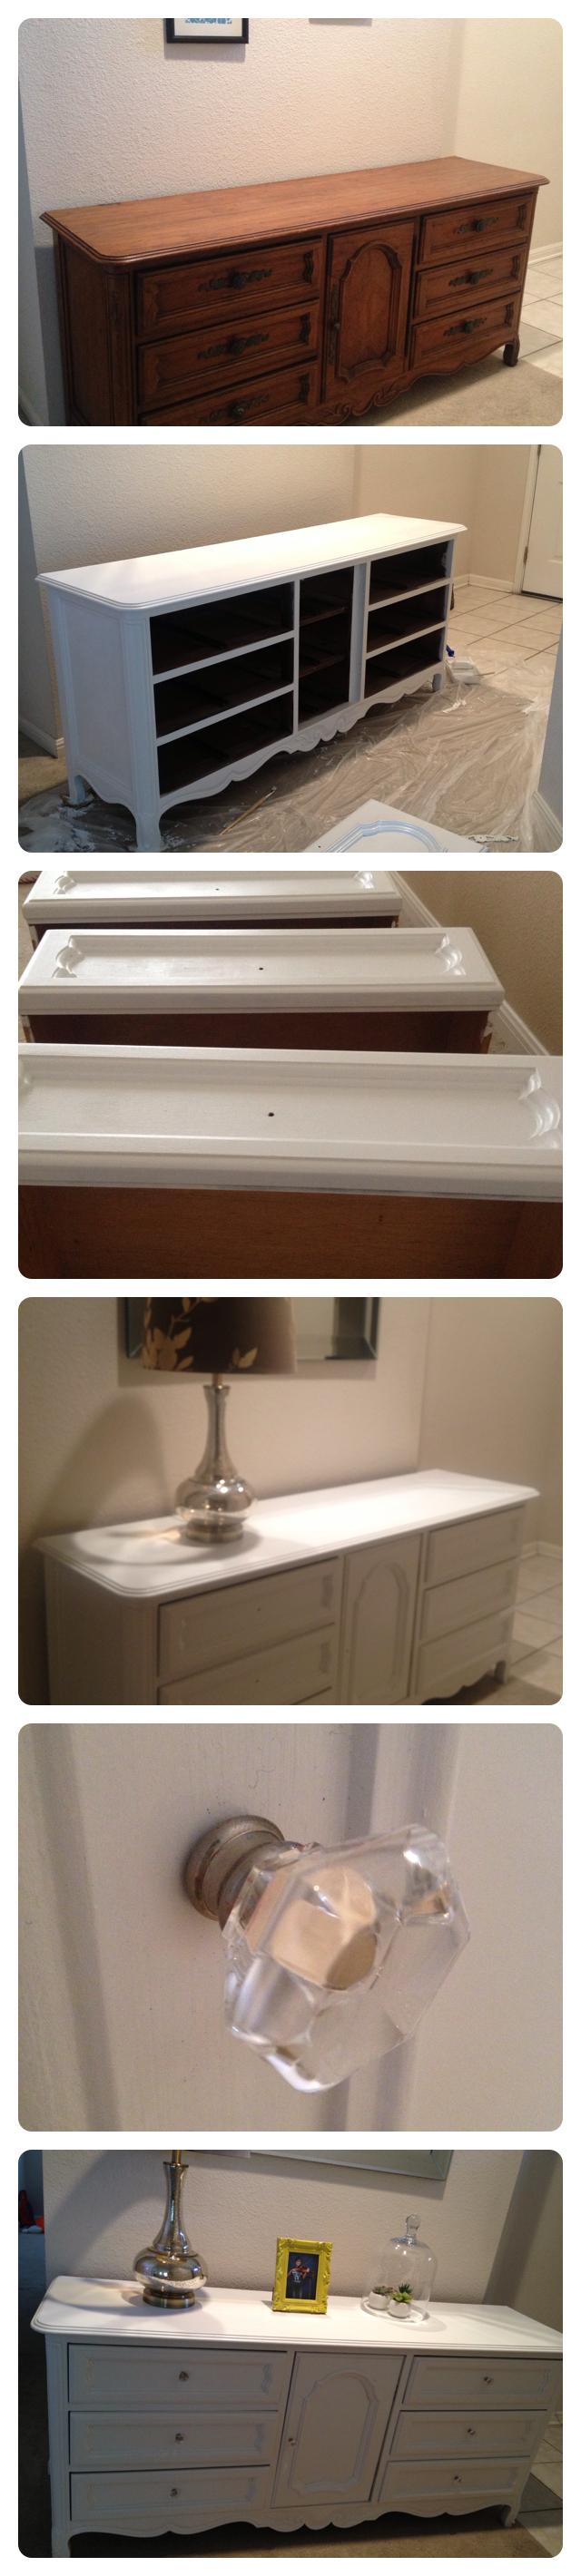 DIY Dresser - Sanded generously, Used Vaspar Signature Paint + Primer, Color:216344 White Semibrilliante/interior (Lowe's), Several Coats